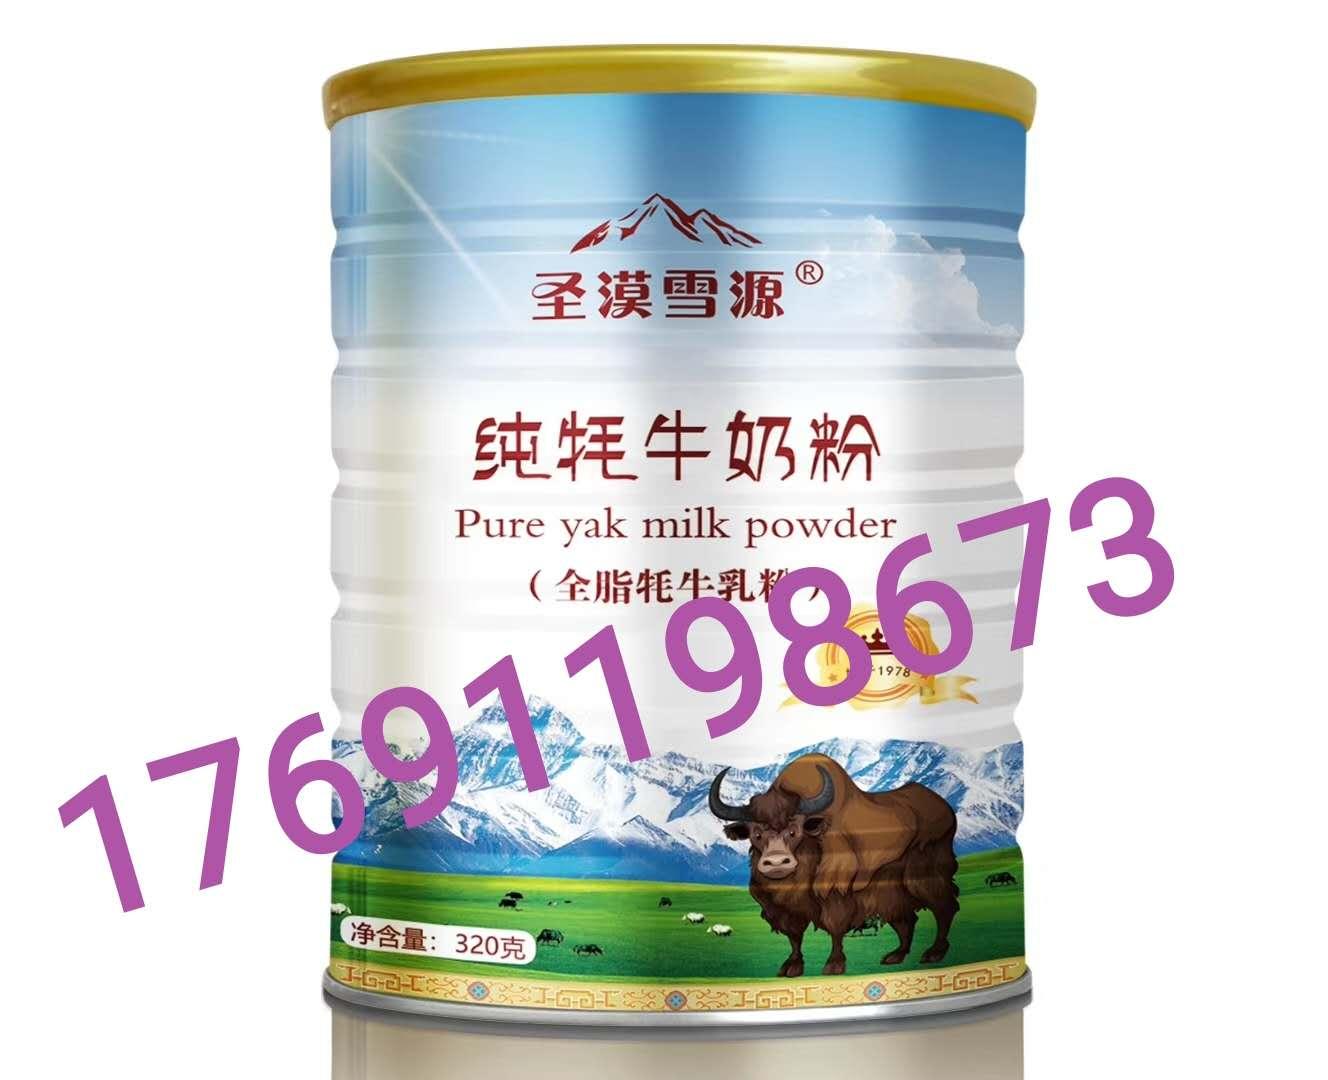 A高原圣漠雪源牦牛奶粉-牦牛奶粉-牦牛奶粉厂家批发